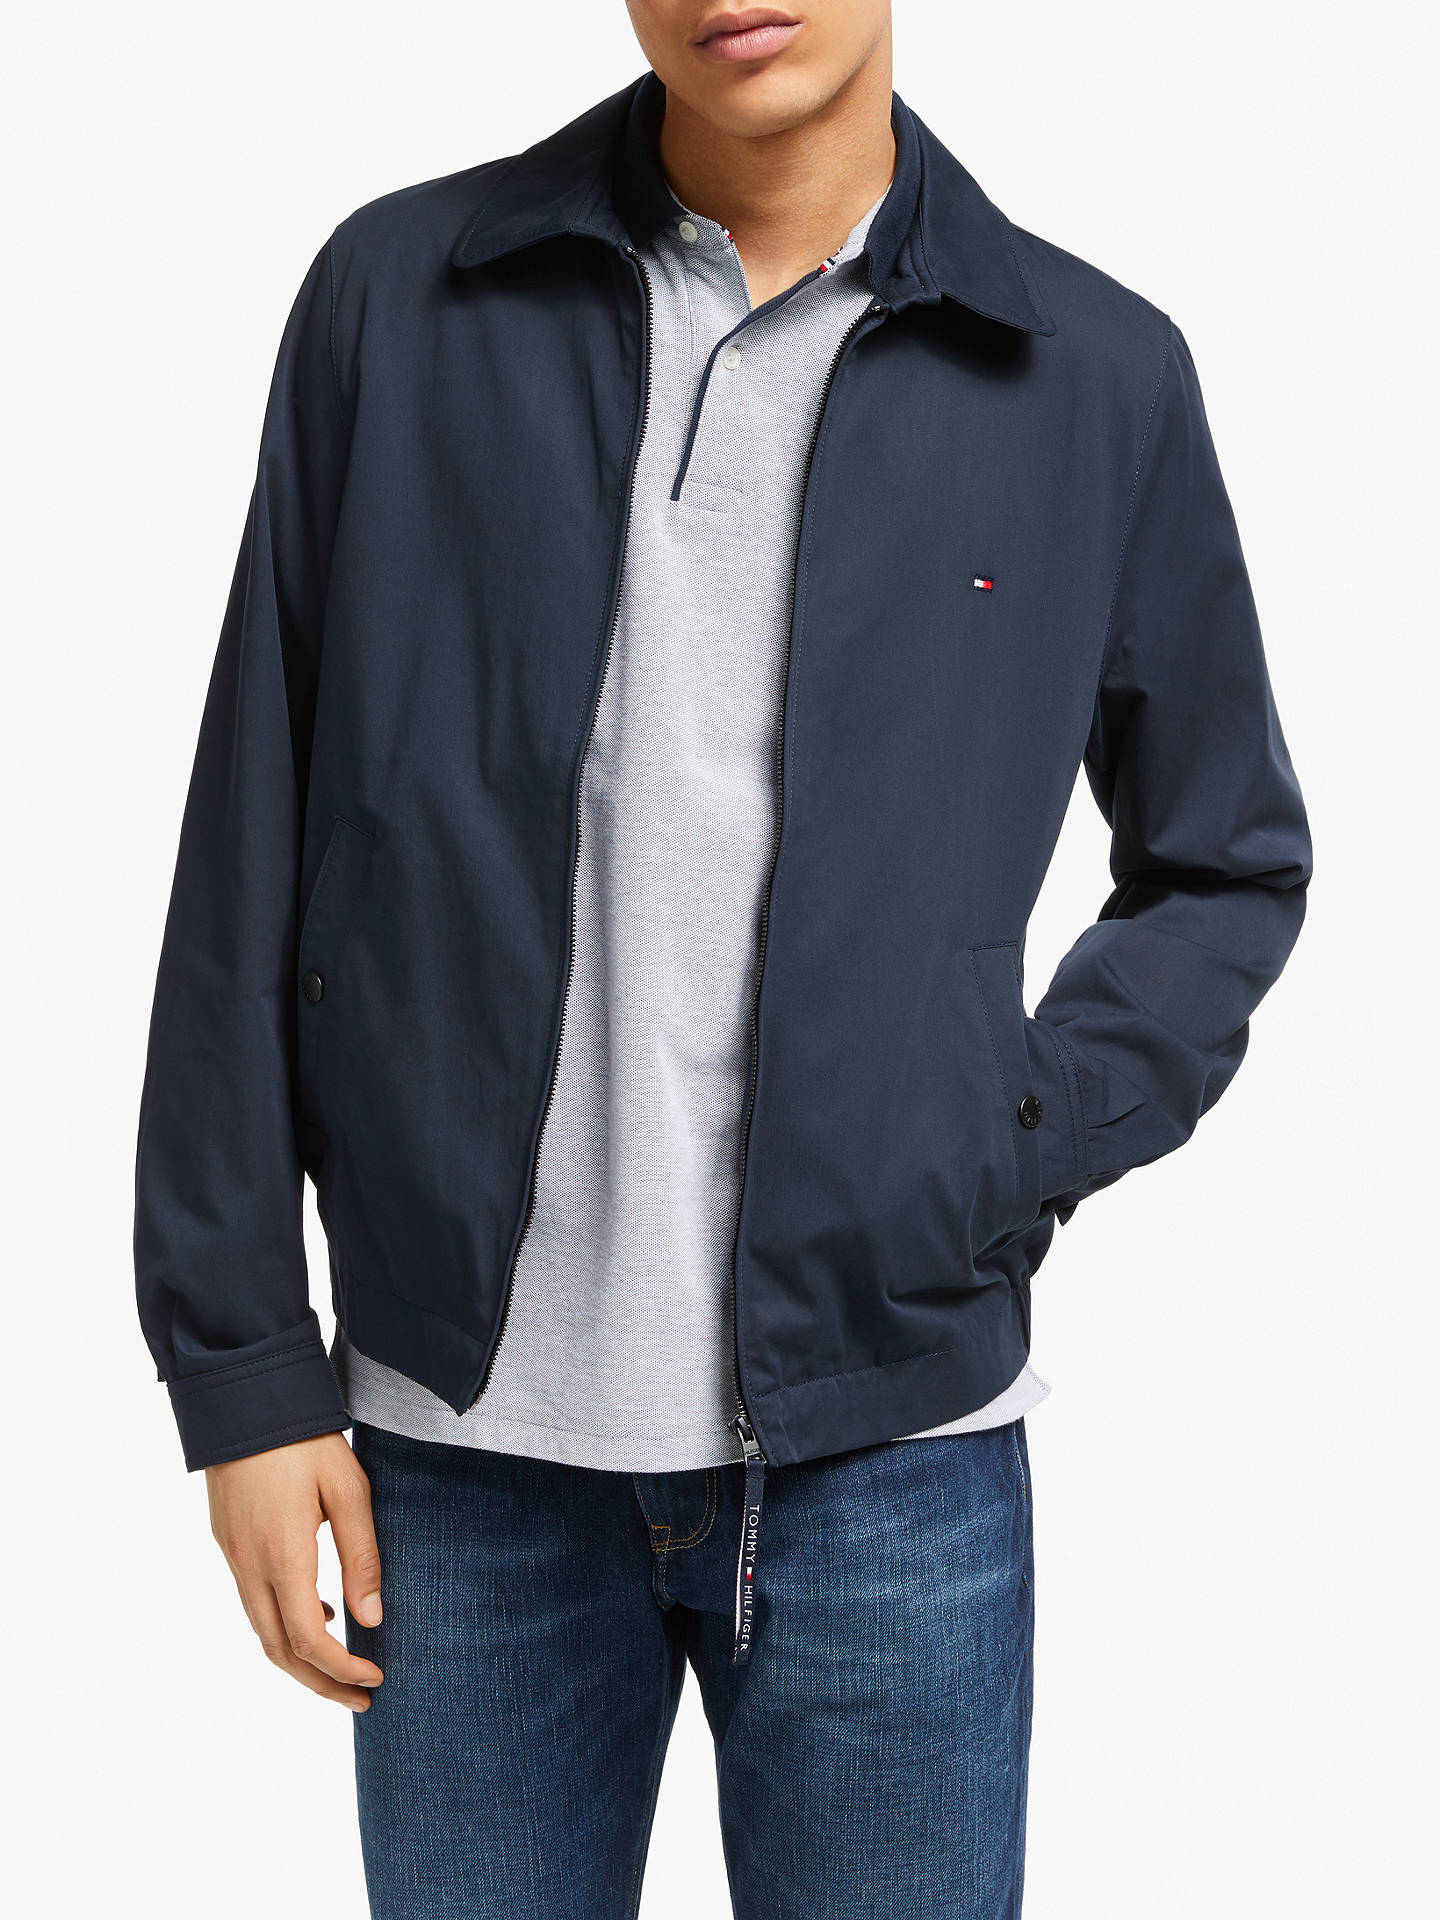 790c72fef81 Buy Tommy Hilfiger New Ivy Jacket